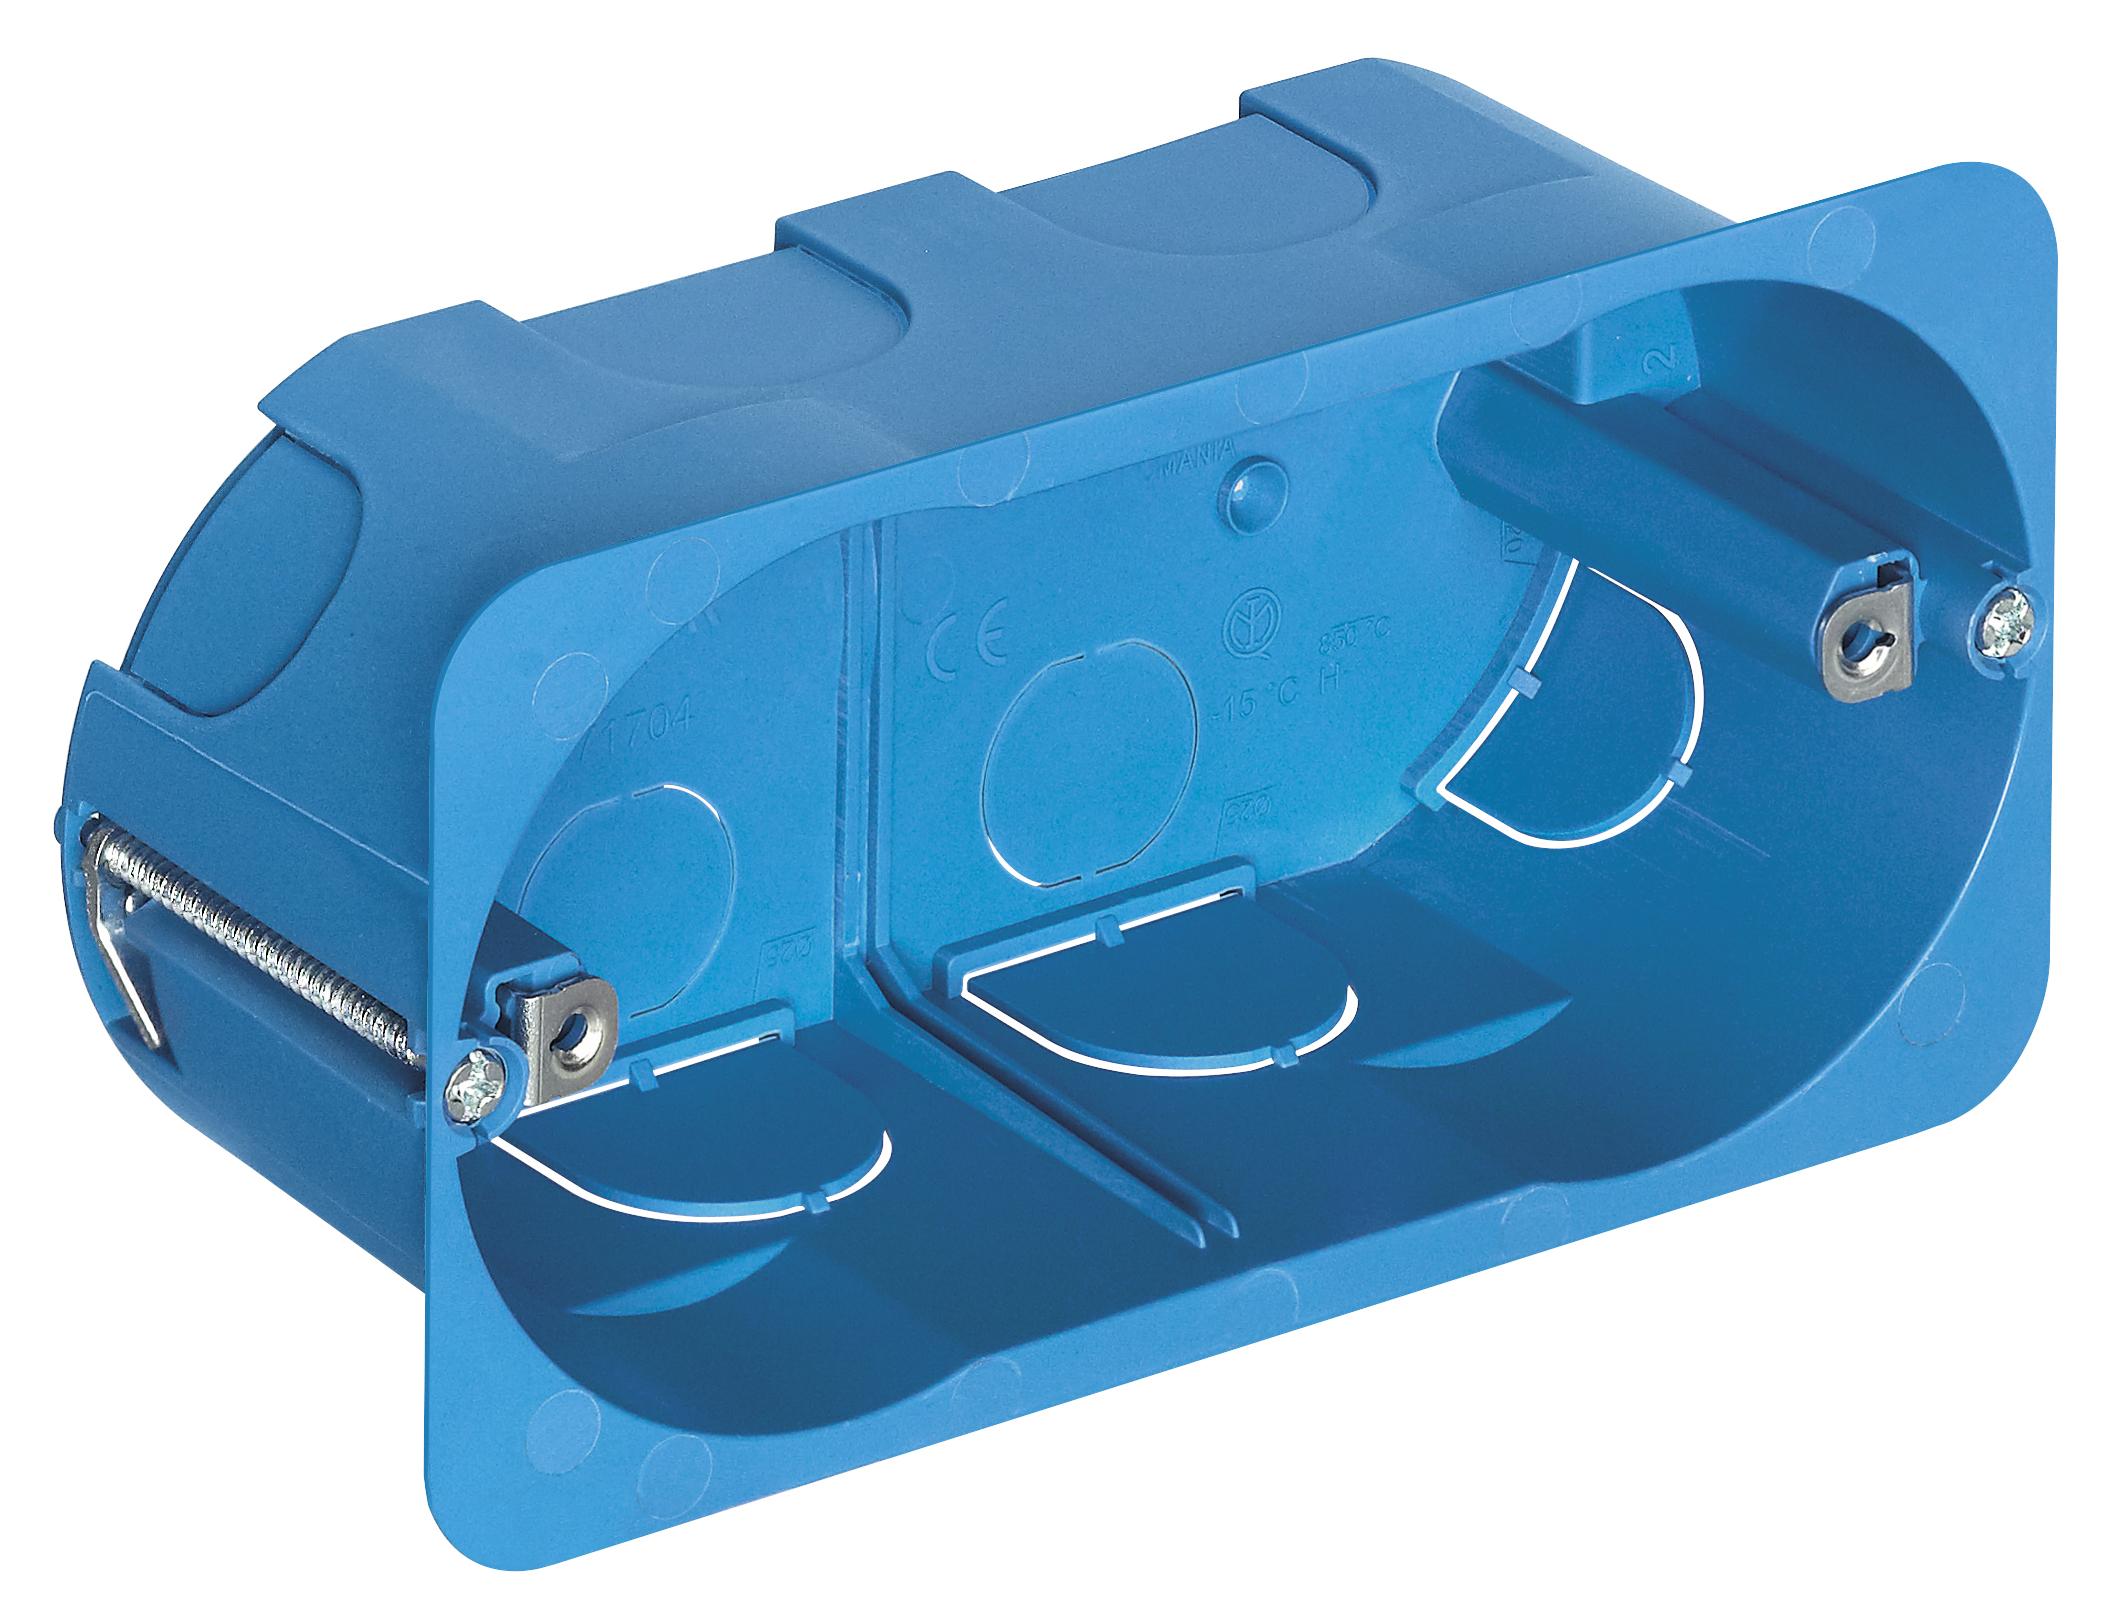 für hohlwand: unterputzdose 4m f/hohlwand hellblau - v71704